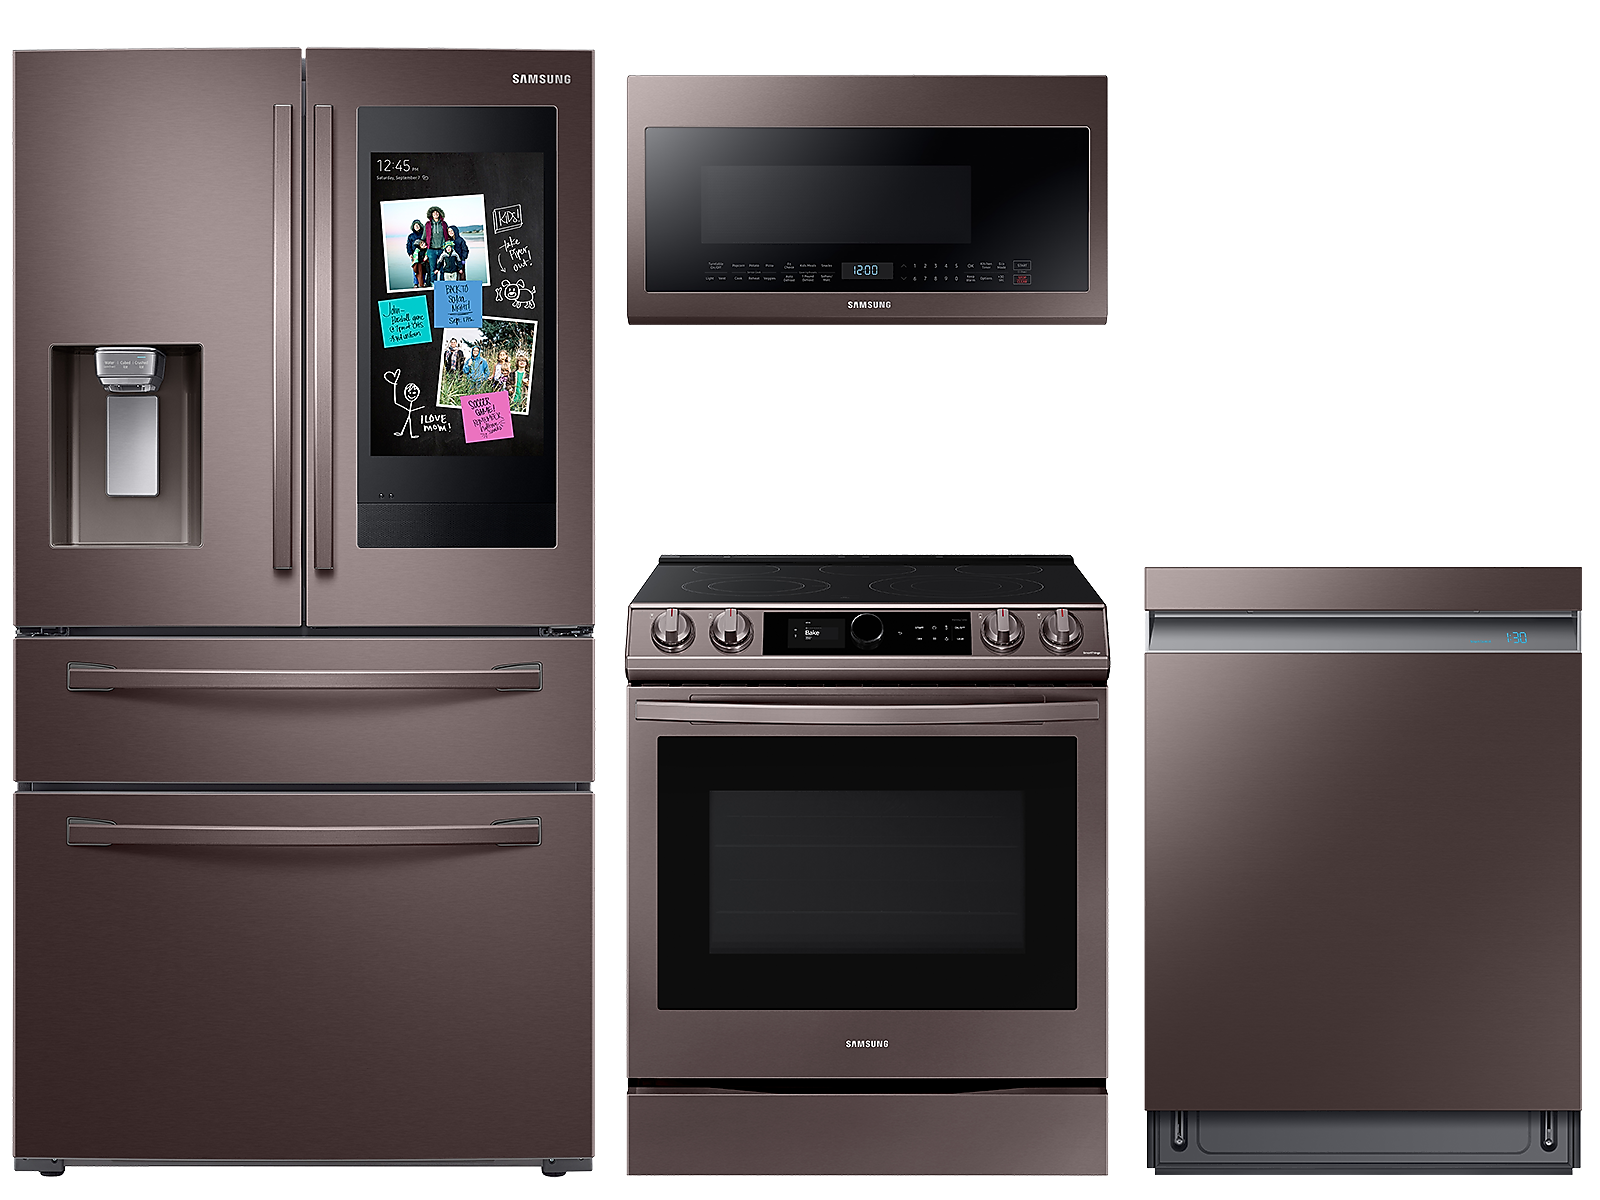 Samsung coupon: Samsung 22 cu. ft. counter depth 4-door Family HubTM refrigerator